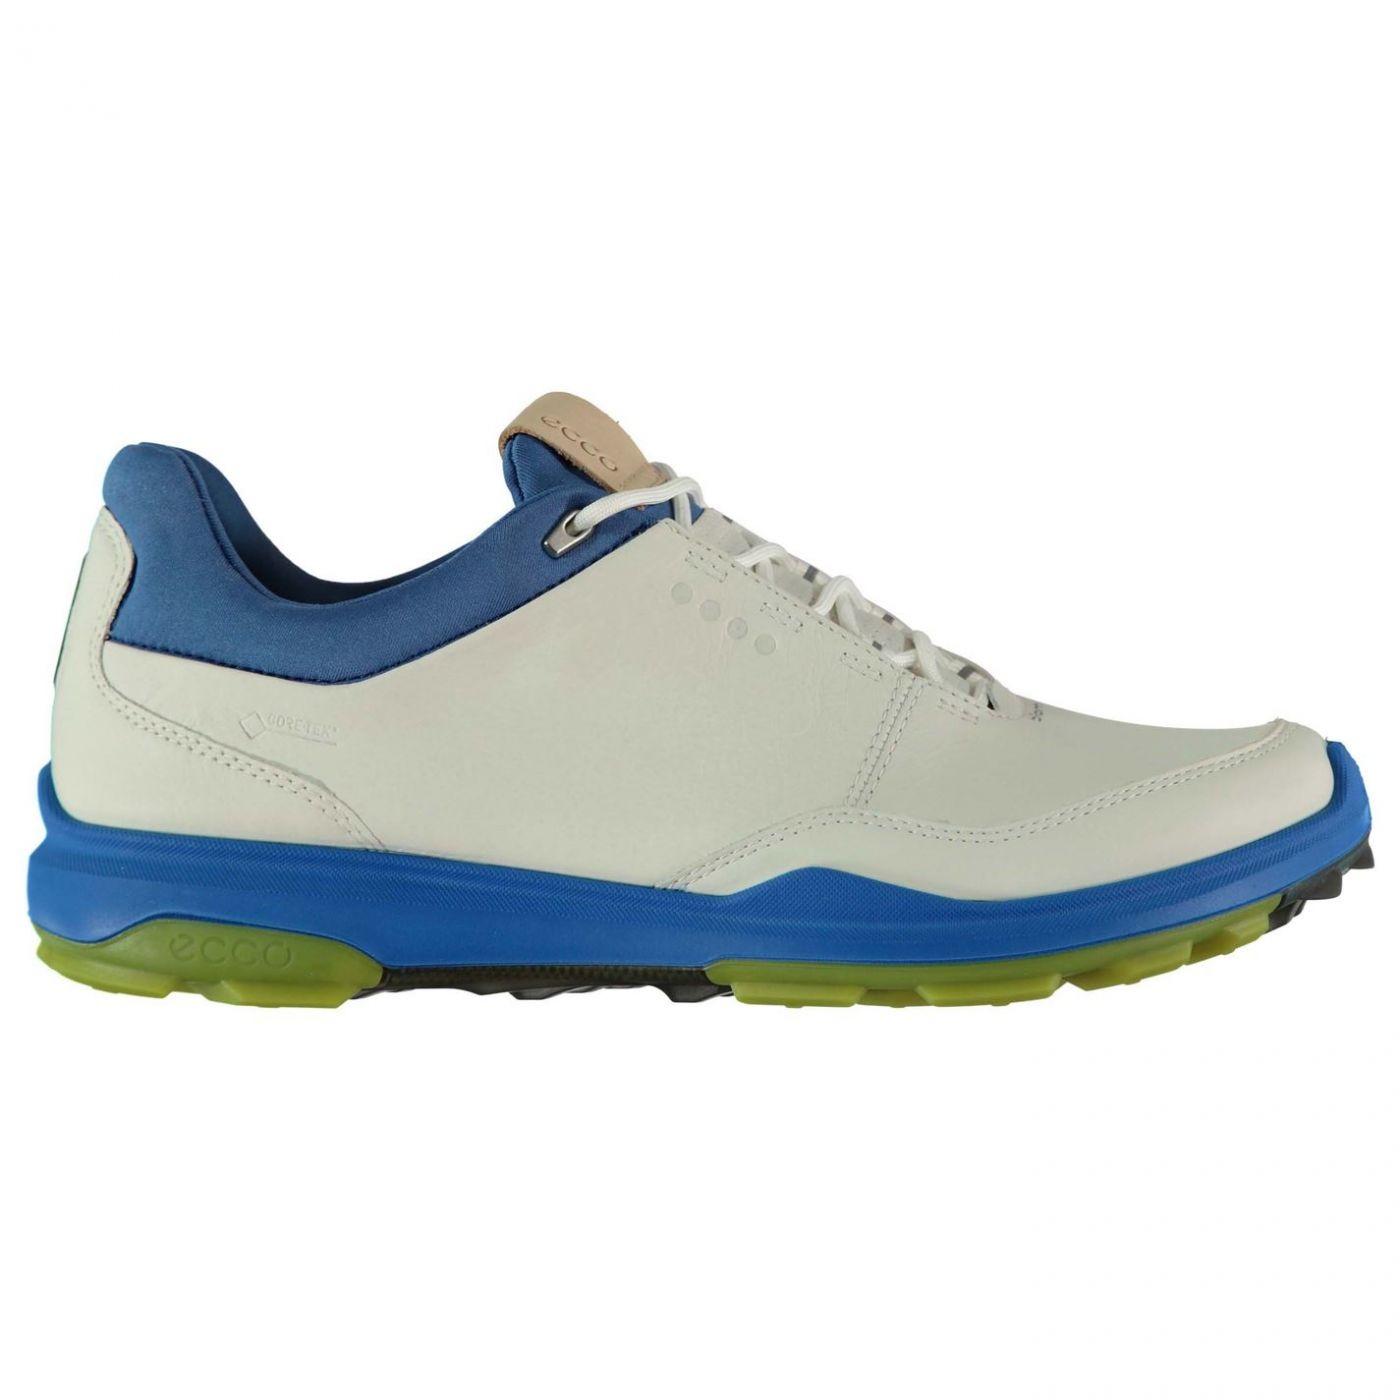 Ecco Biom Hybrid 3 Mens Golf Shoes